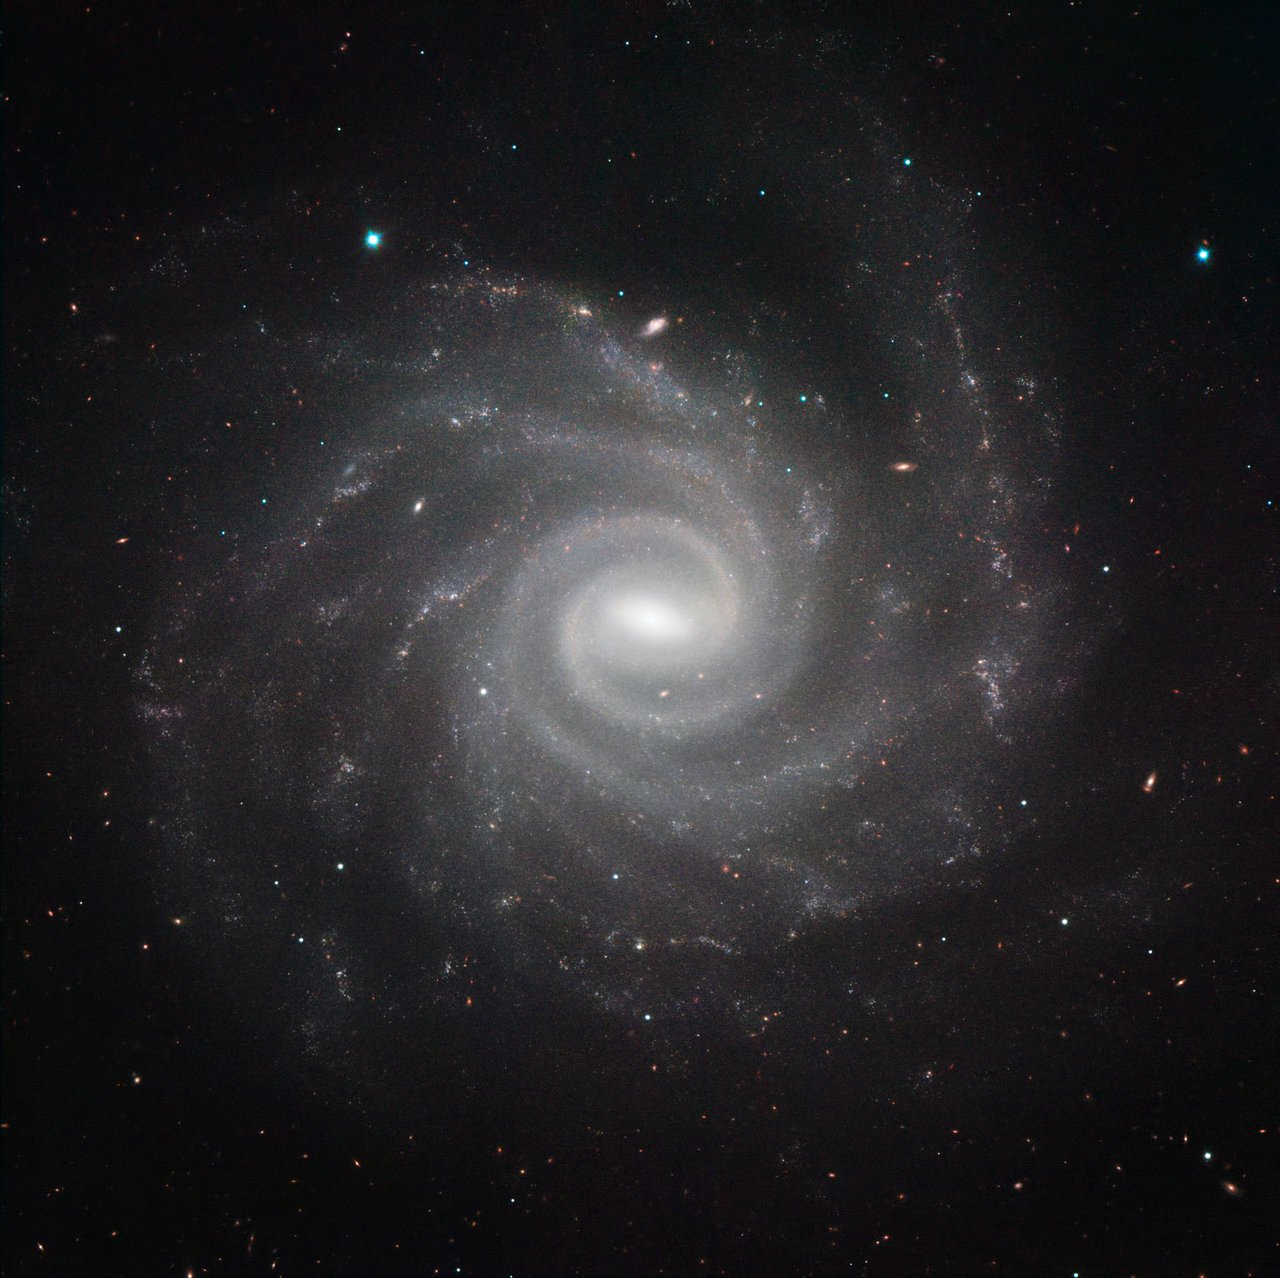 HAWK-I image of NGC 1232